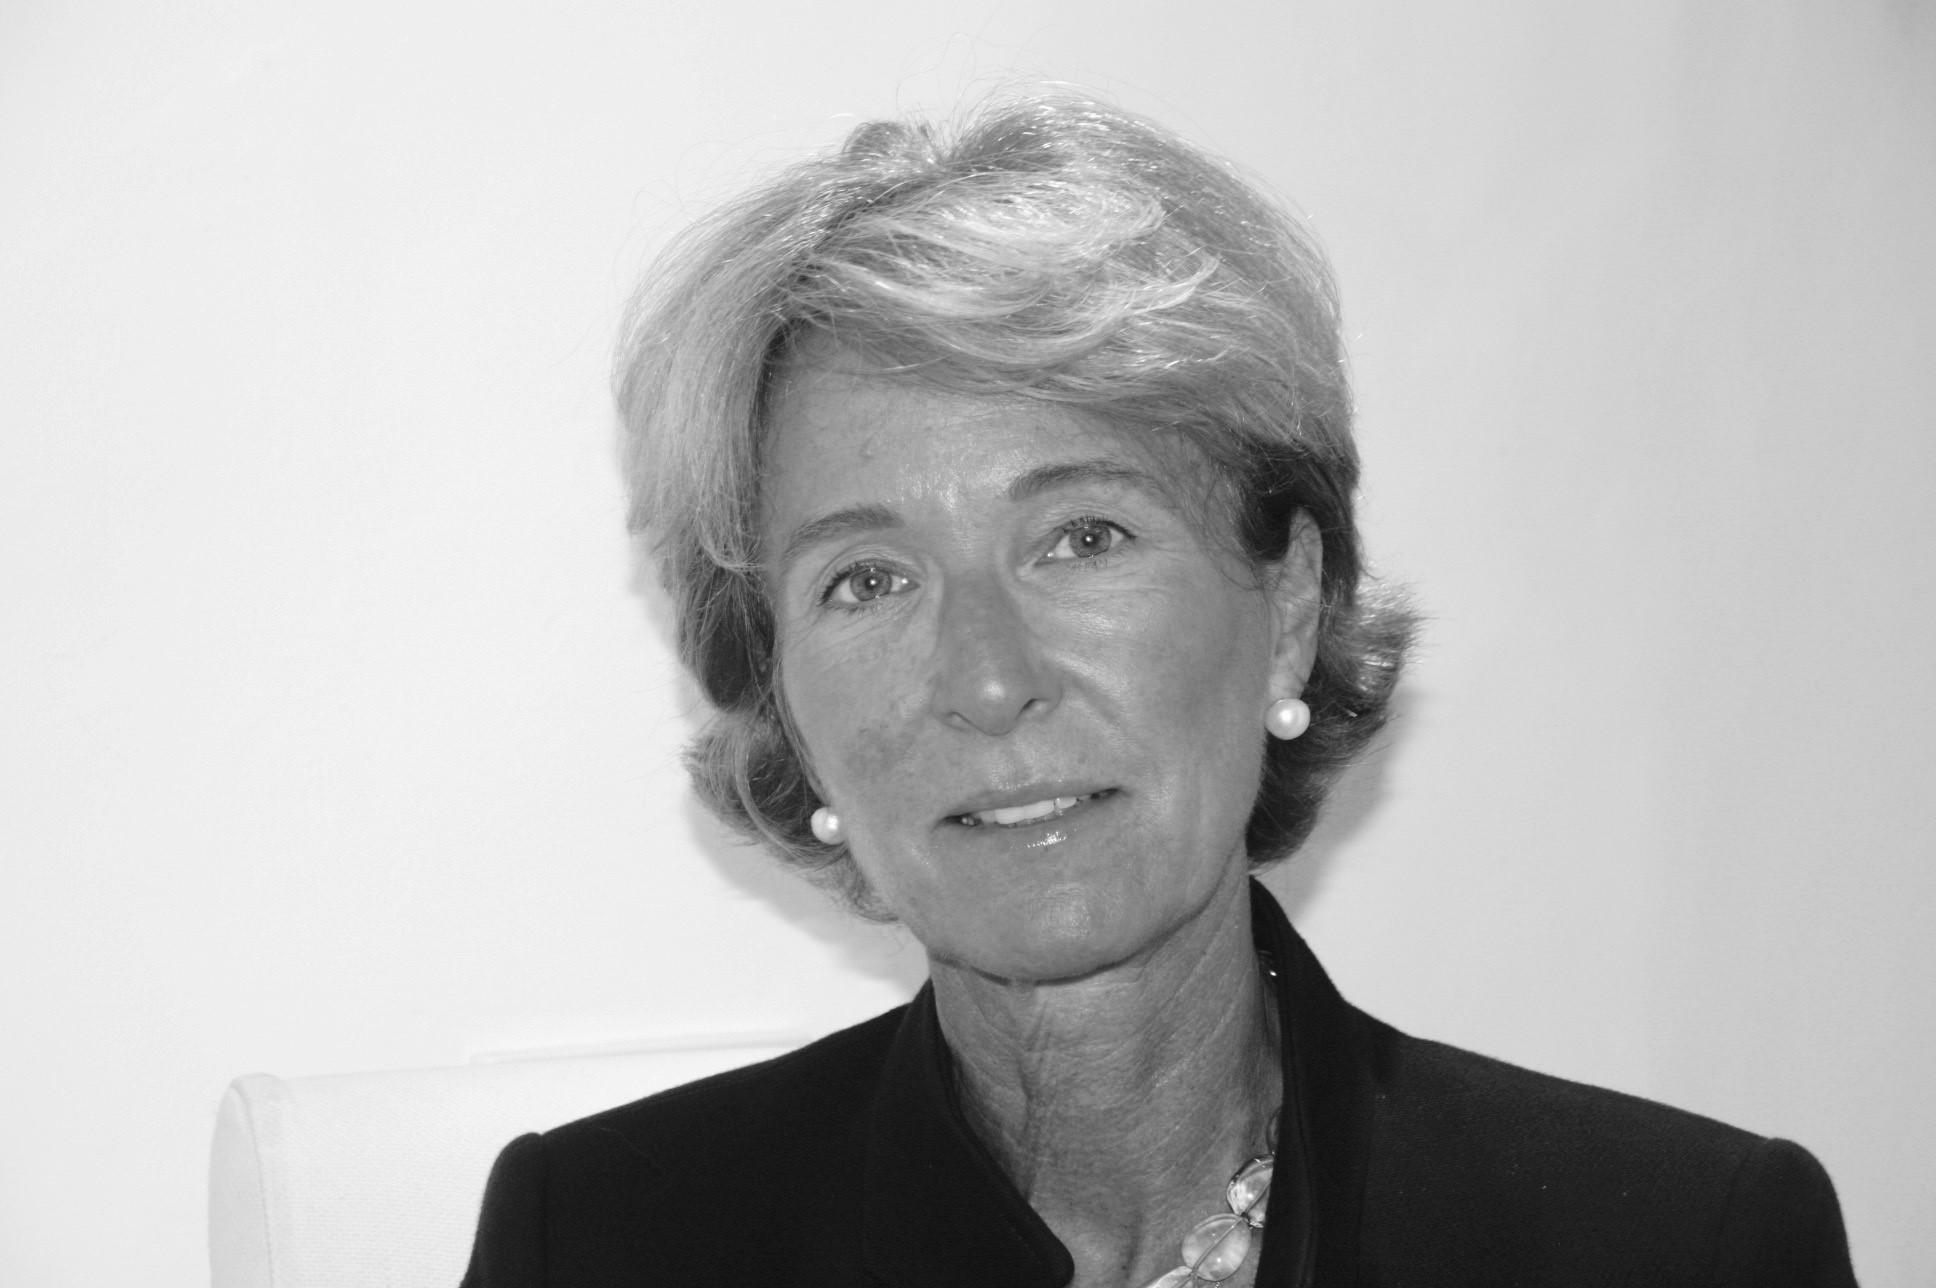 Laura Ryall